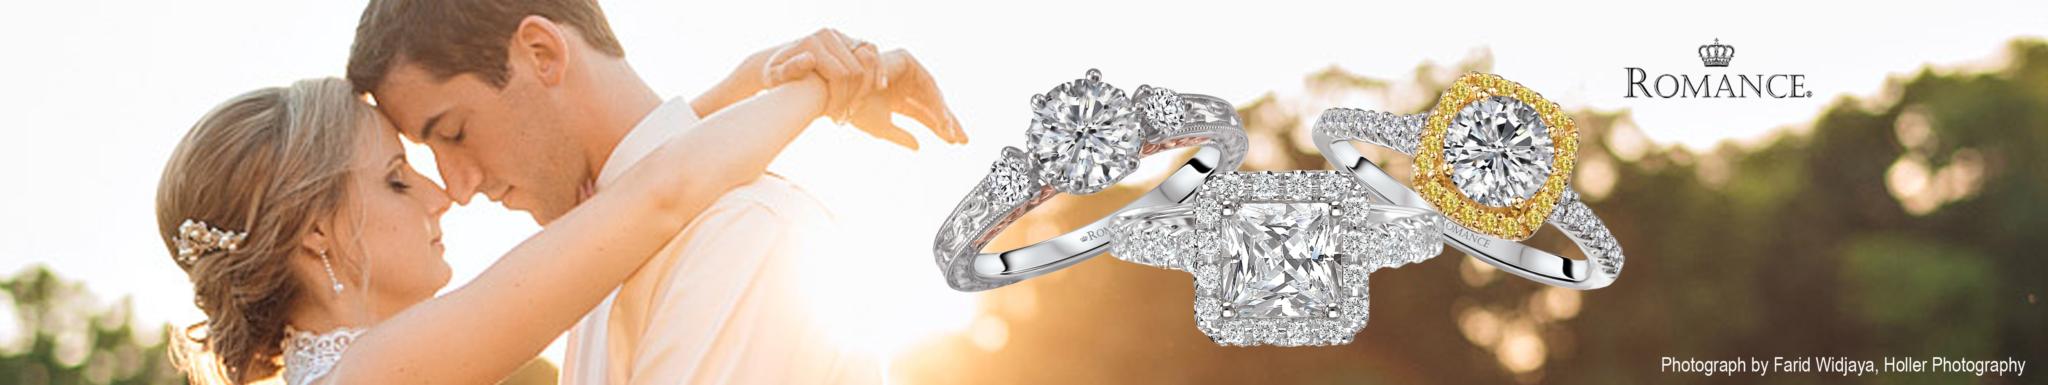 Engagement Rings Romance Banner